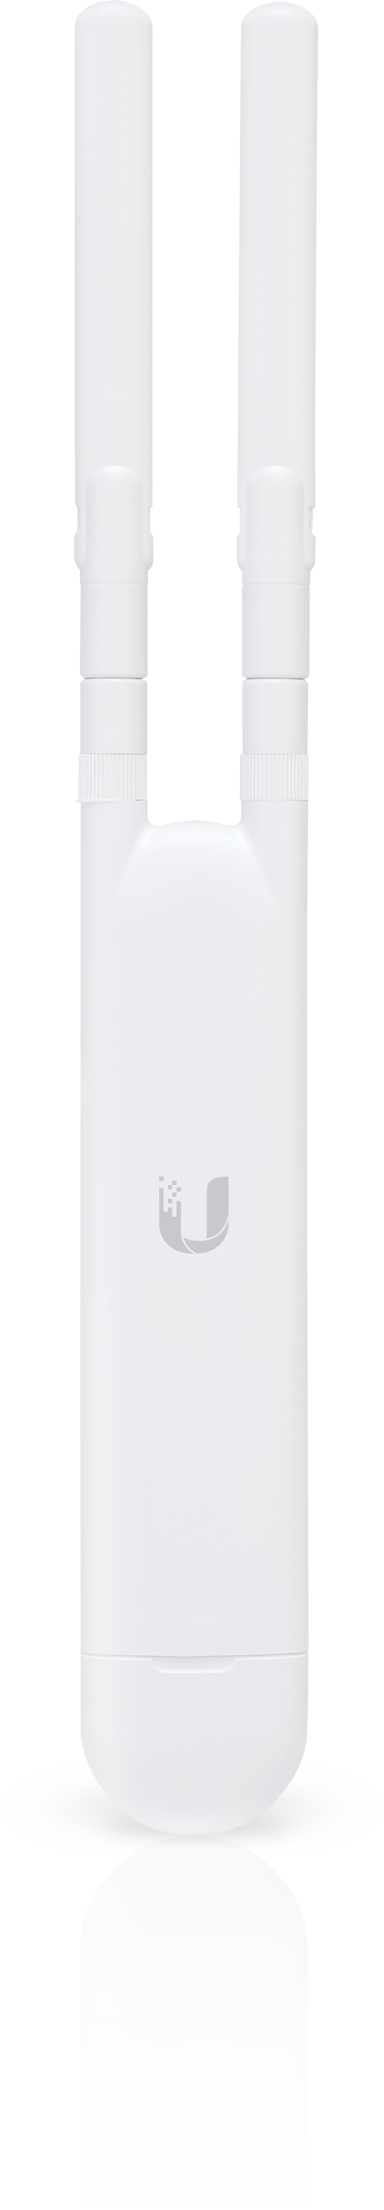 Ubiquiti Unifi UAP-AC-M